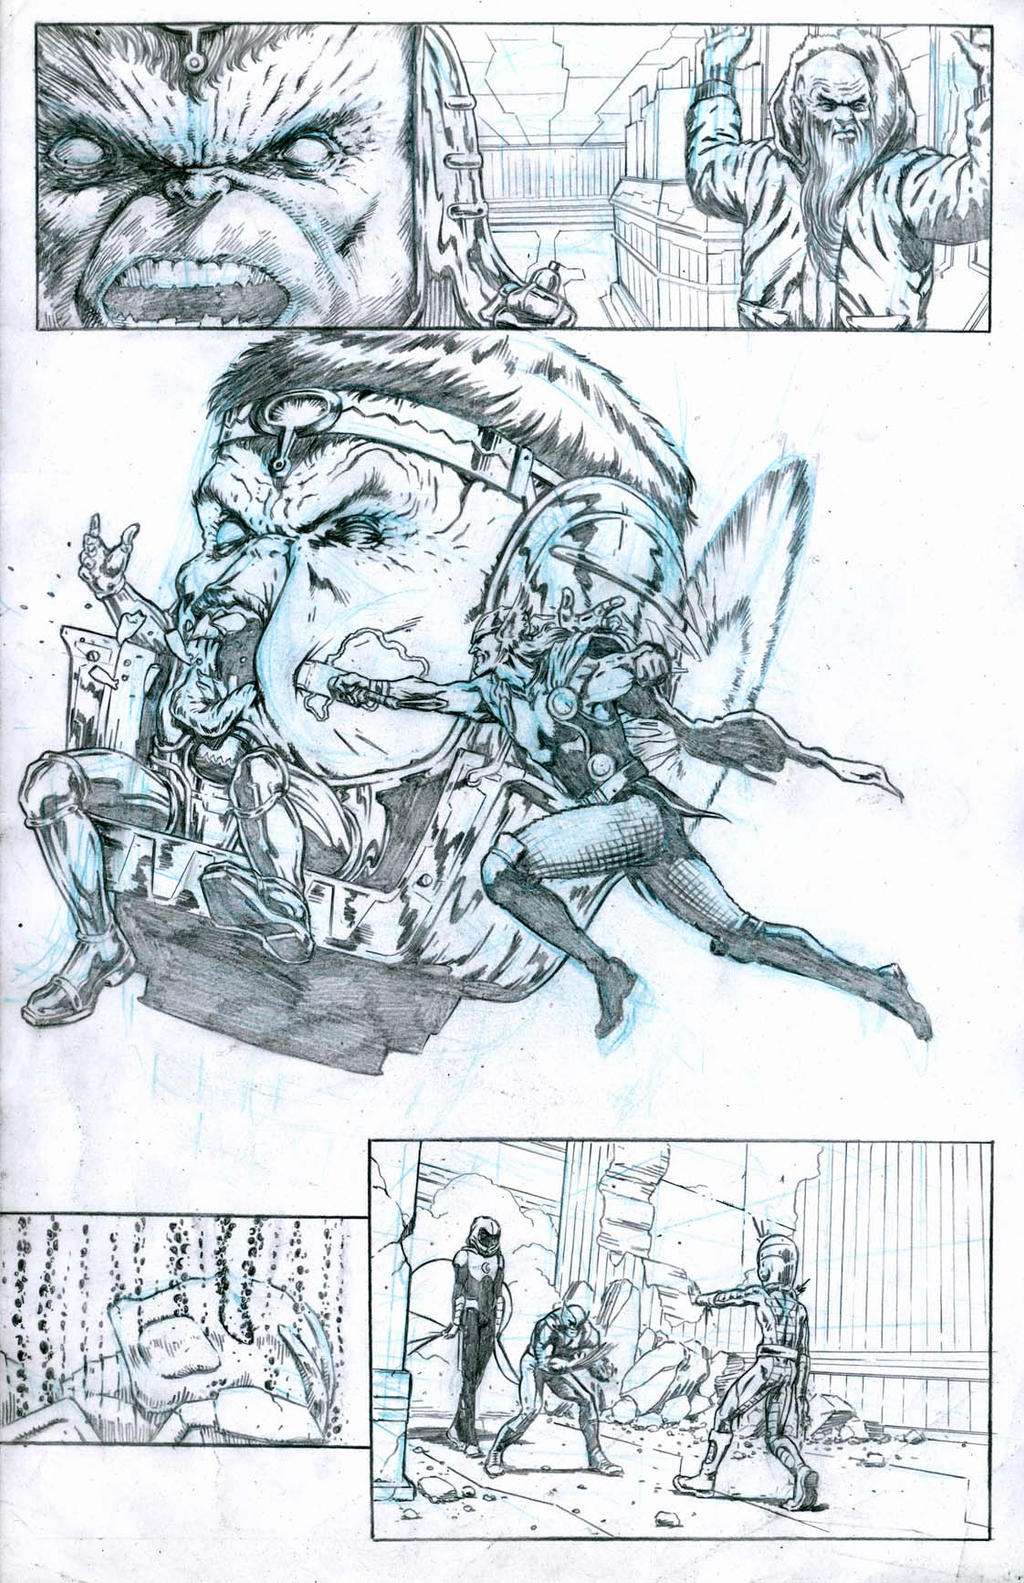 SanEspina Avengers page22 by santiagocomics